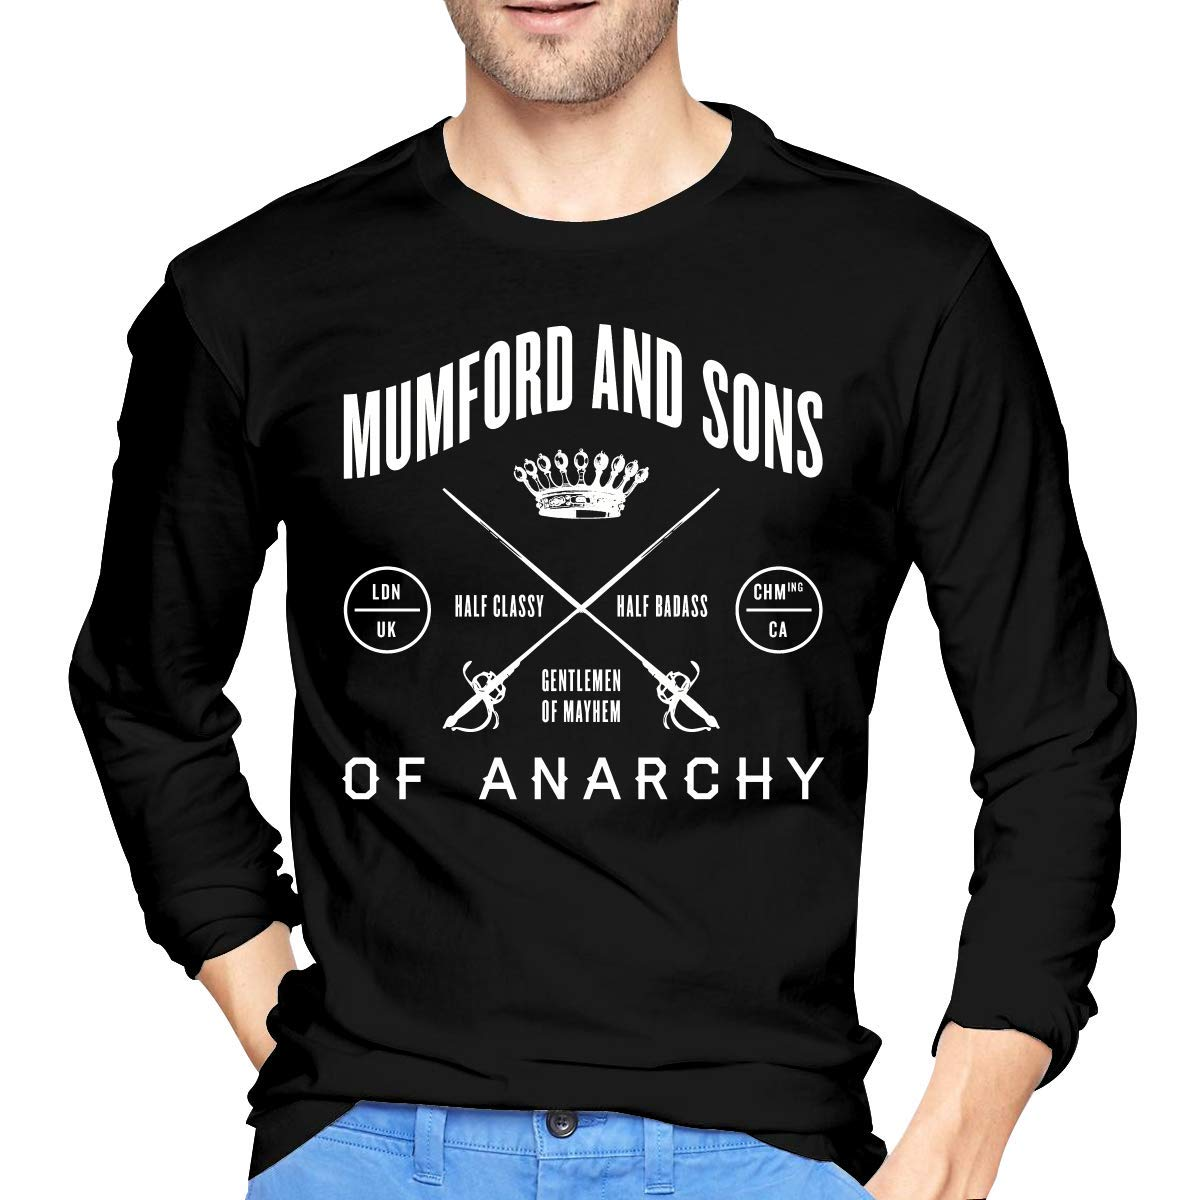 Mum And Sons Classic Tshirt 5800